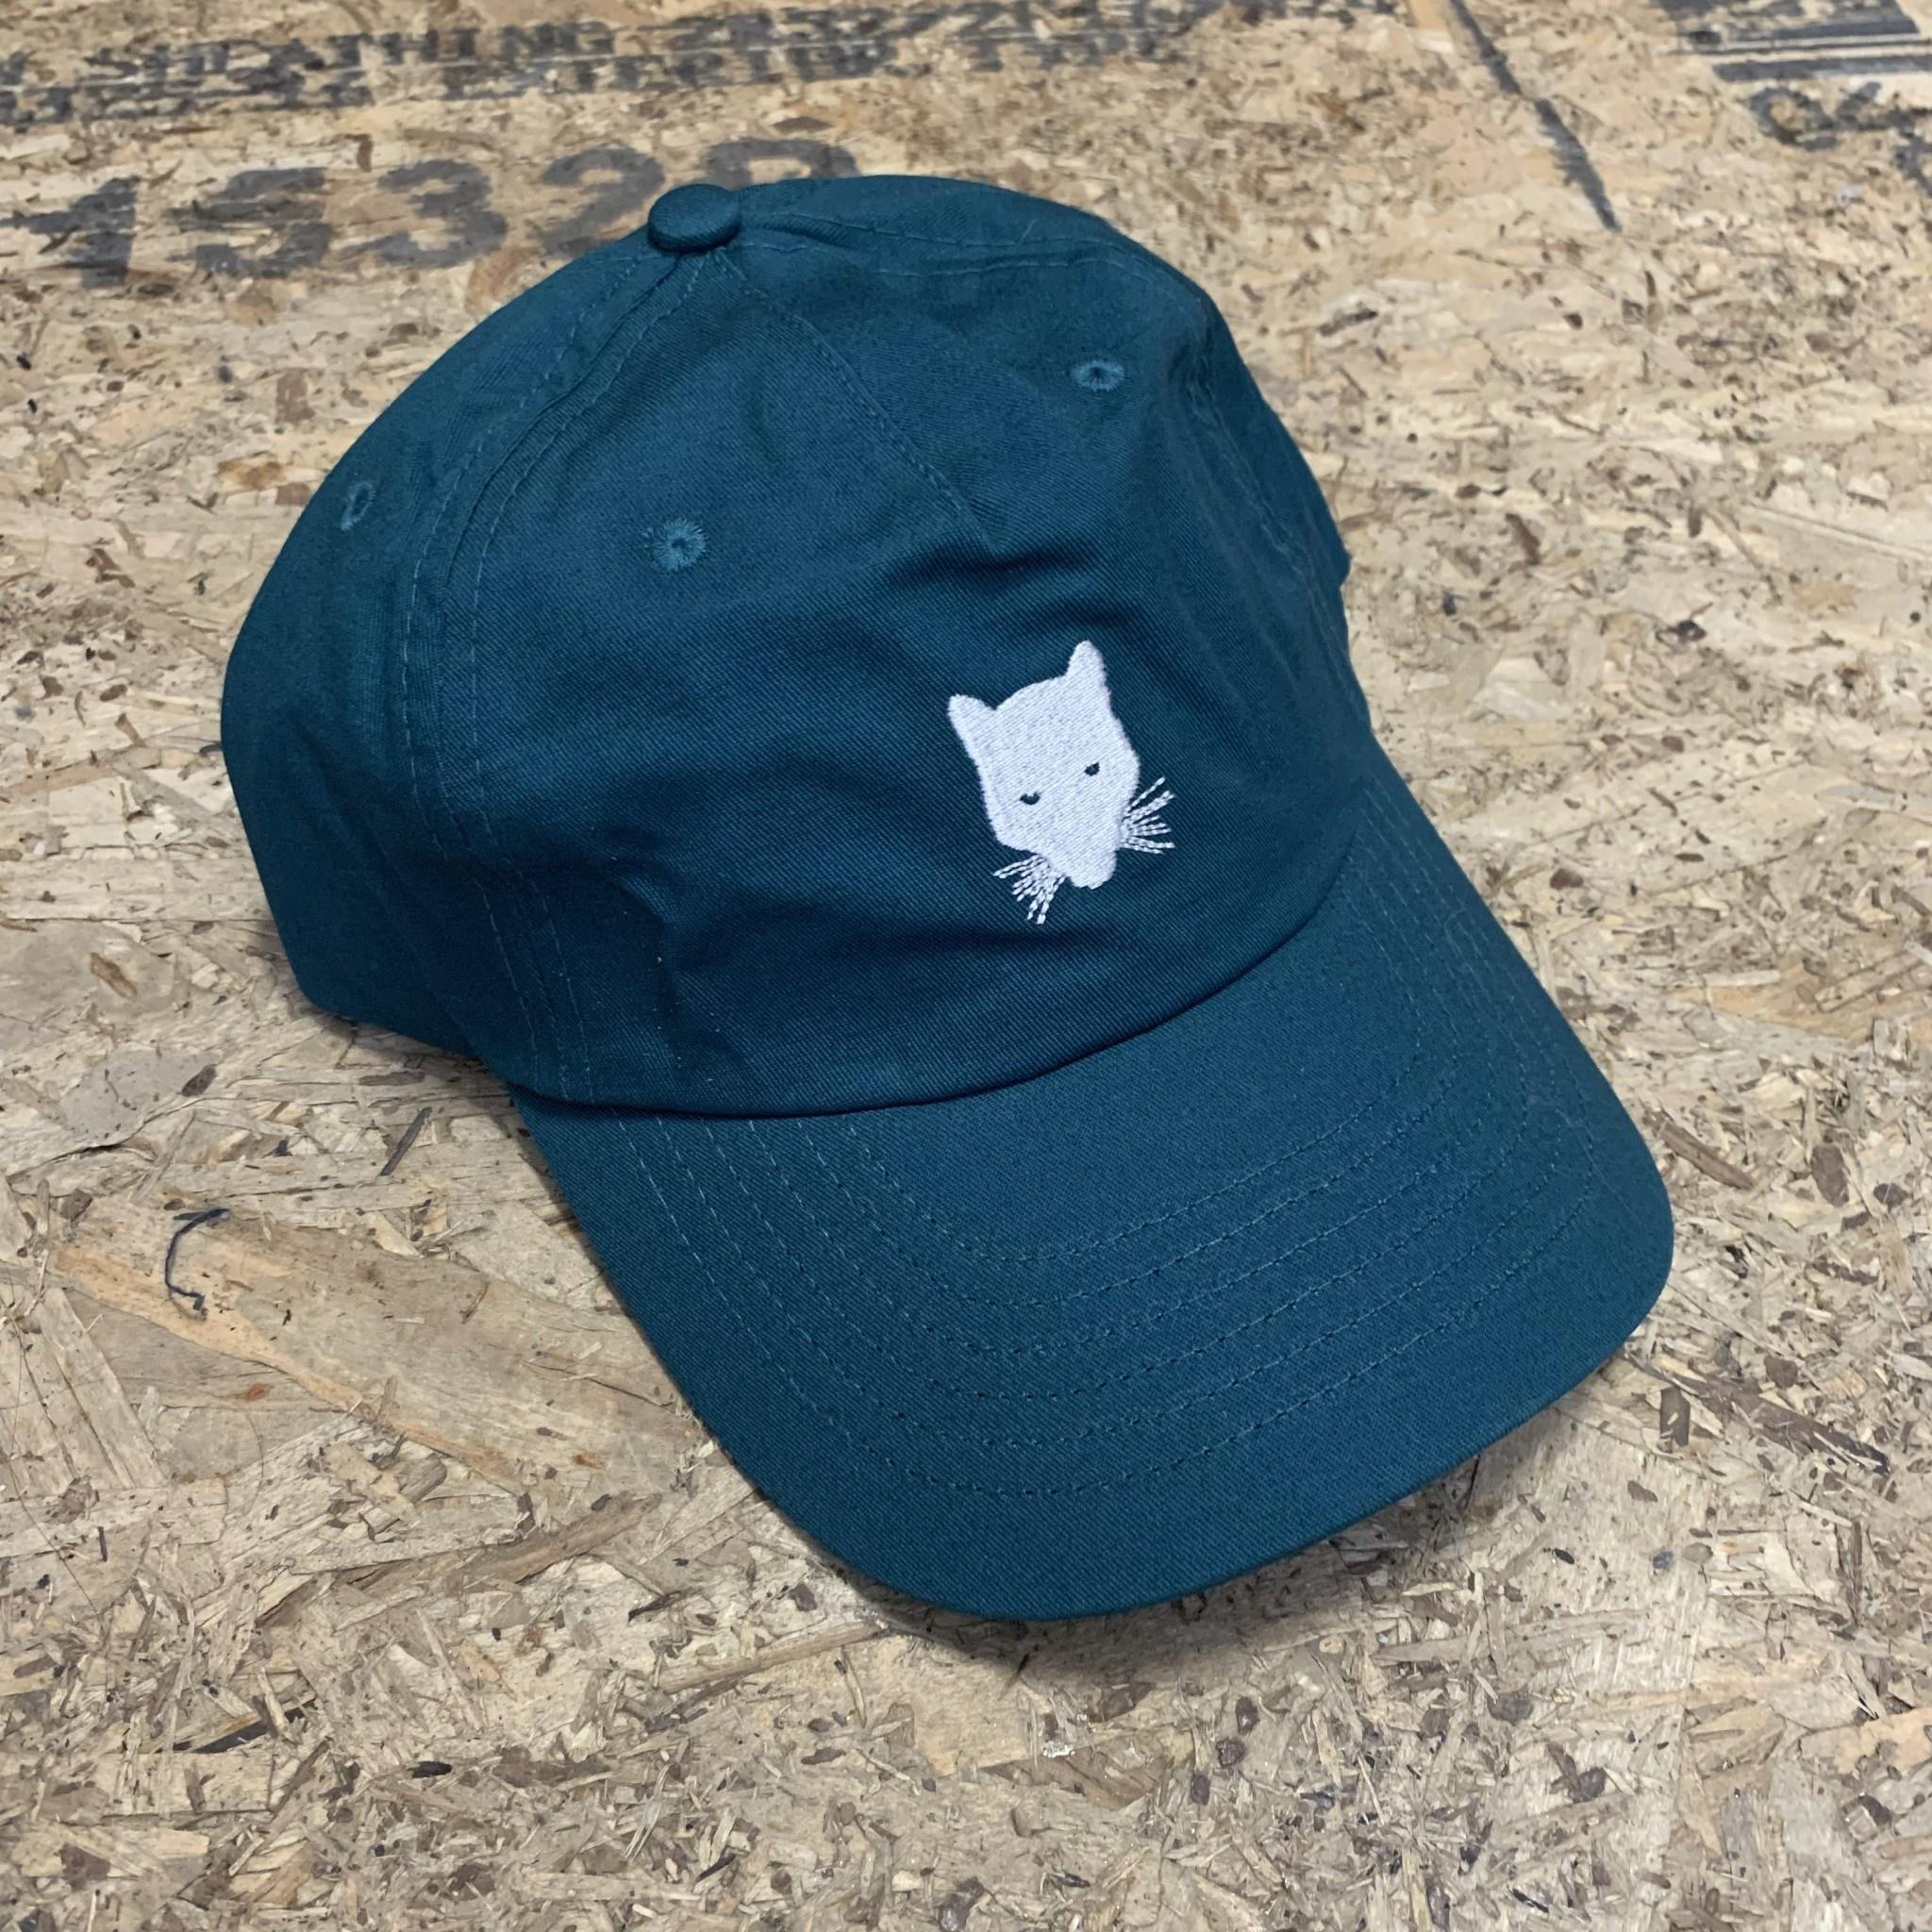 SomewonCollective - Cougar Dad Cap